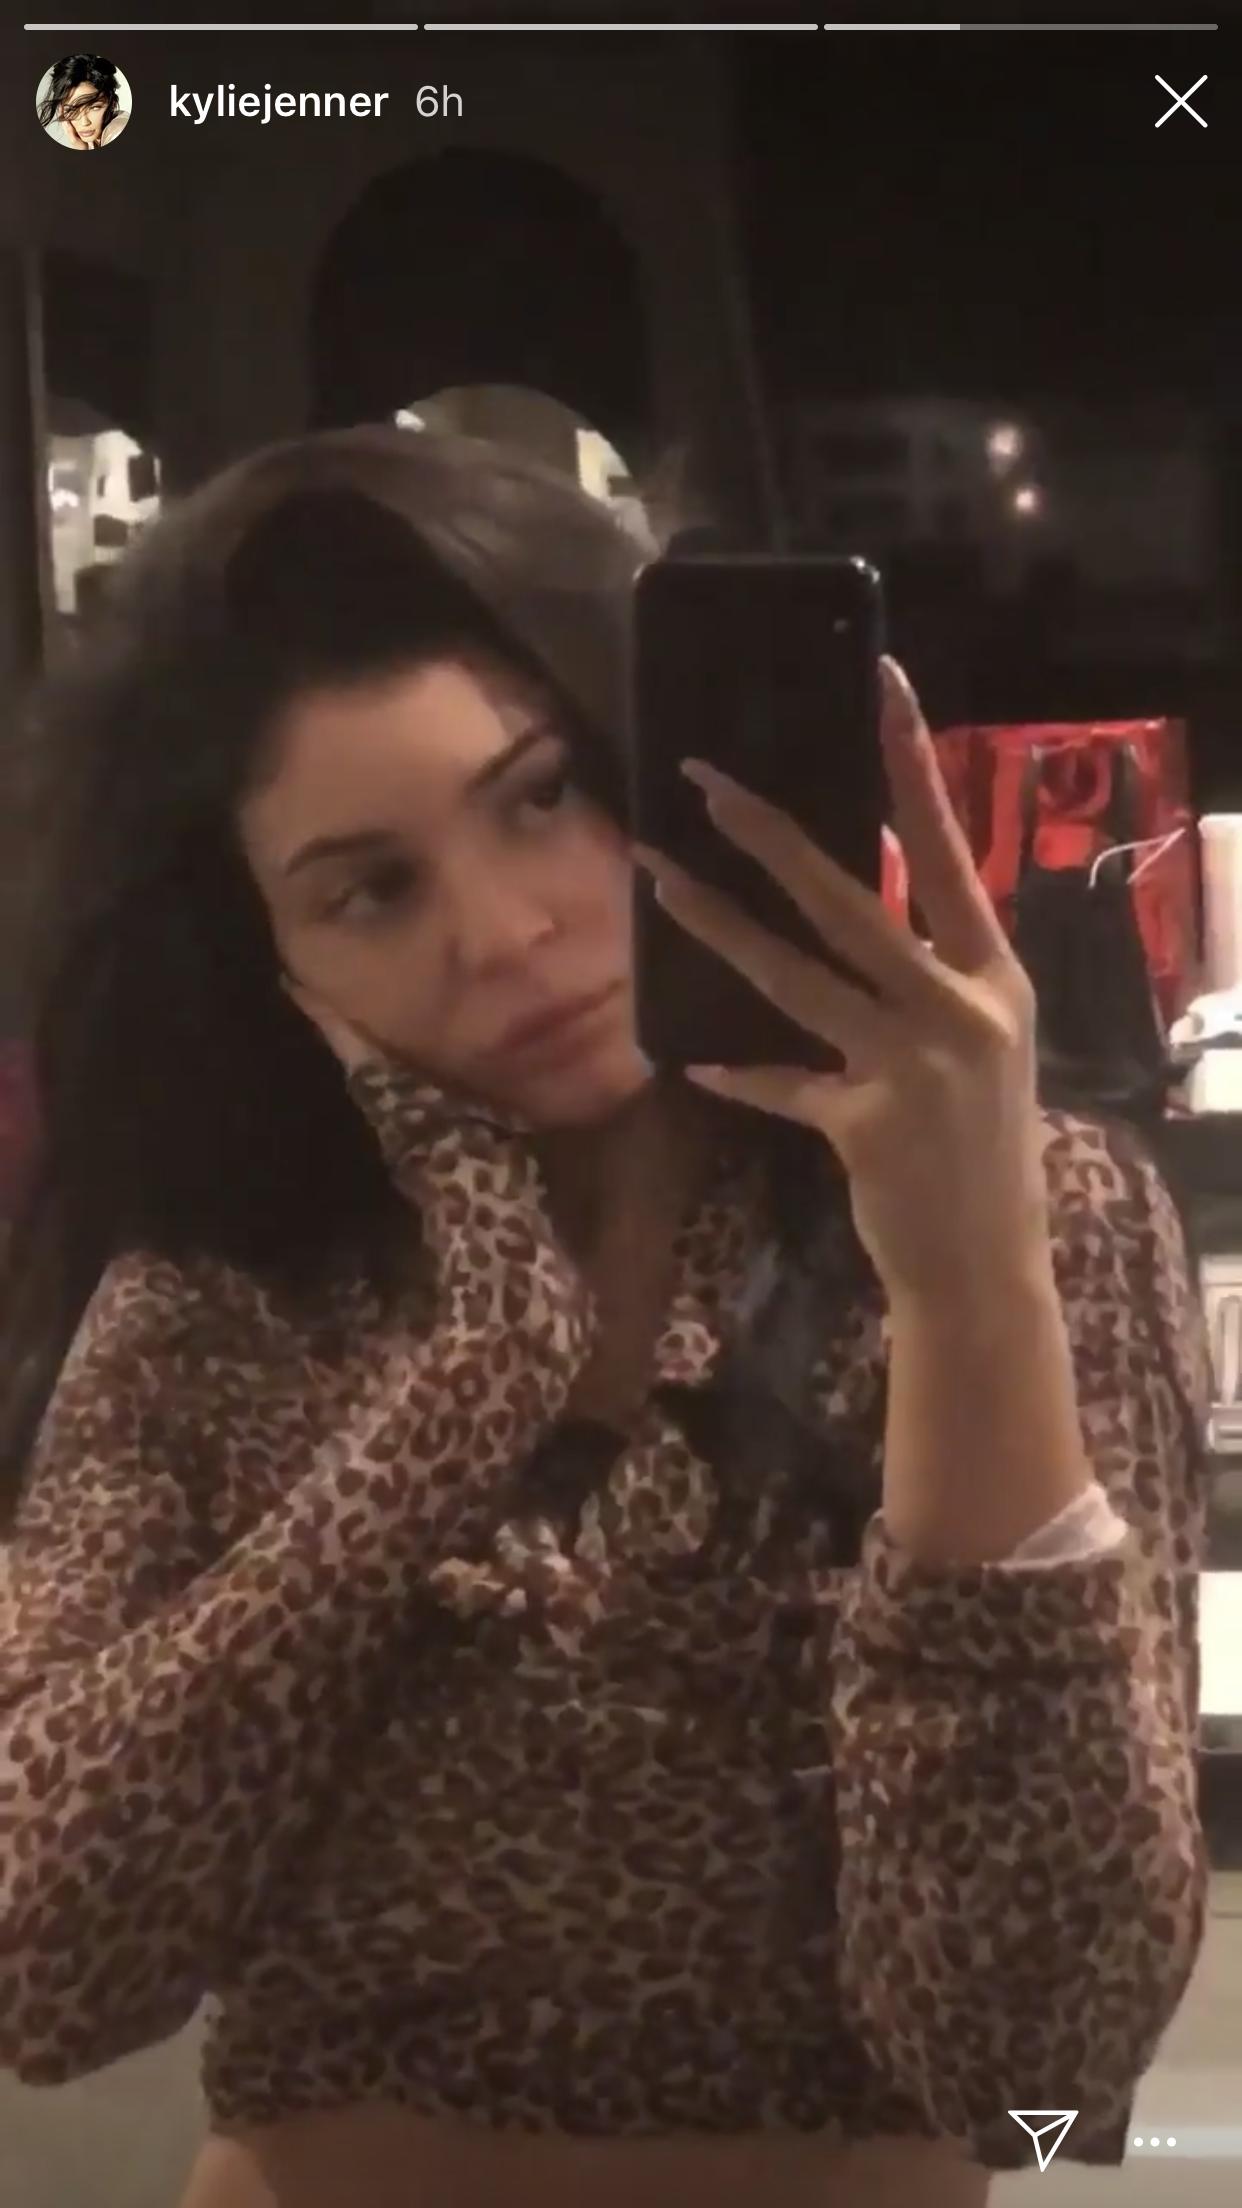 Khloe Kardashian, Kylie Jenner post cryptic Instagram Stories amid cheating scandal